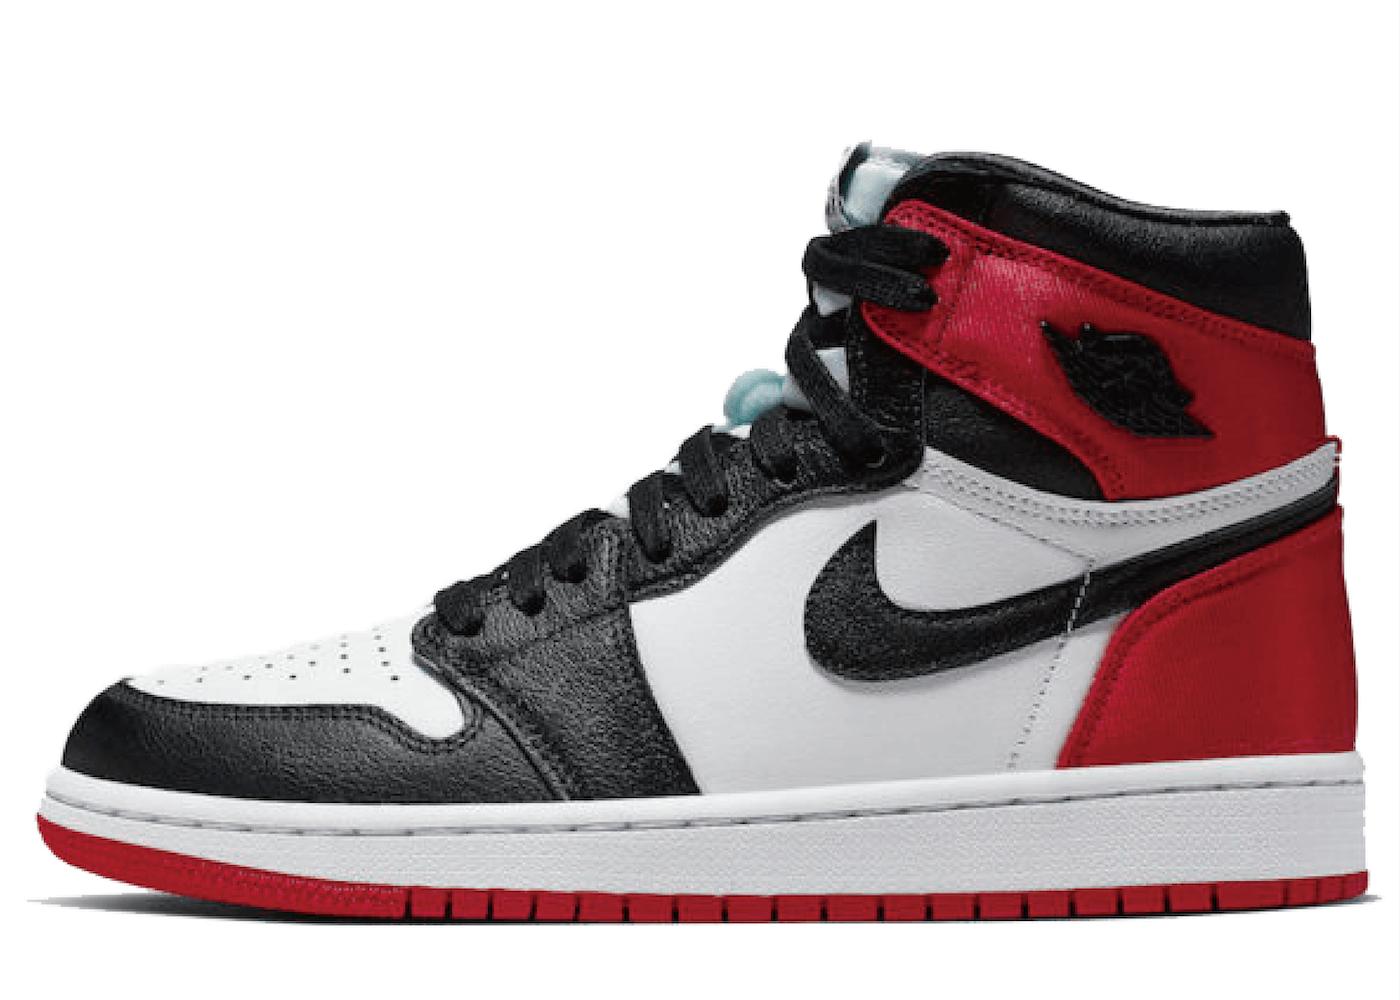 Nike Air Jordan 1 Retro High Satin Black Toe Womensの写真